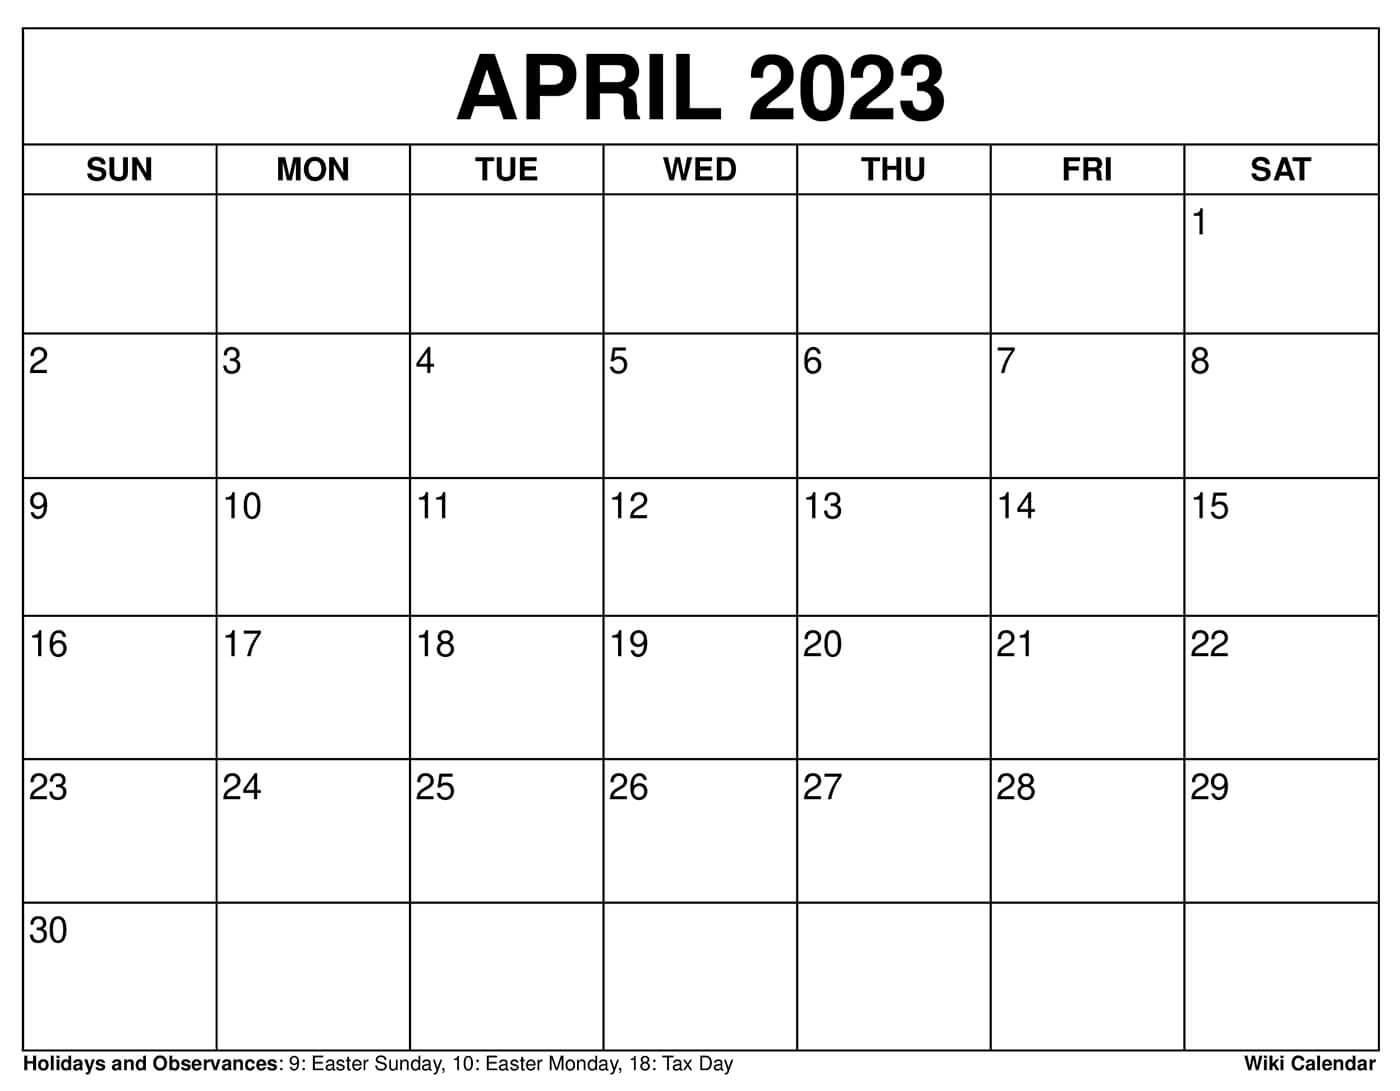 April 2023 Calendar